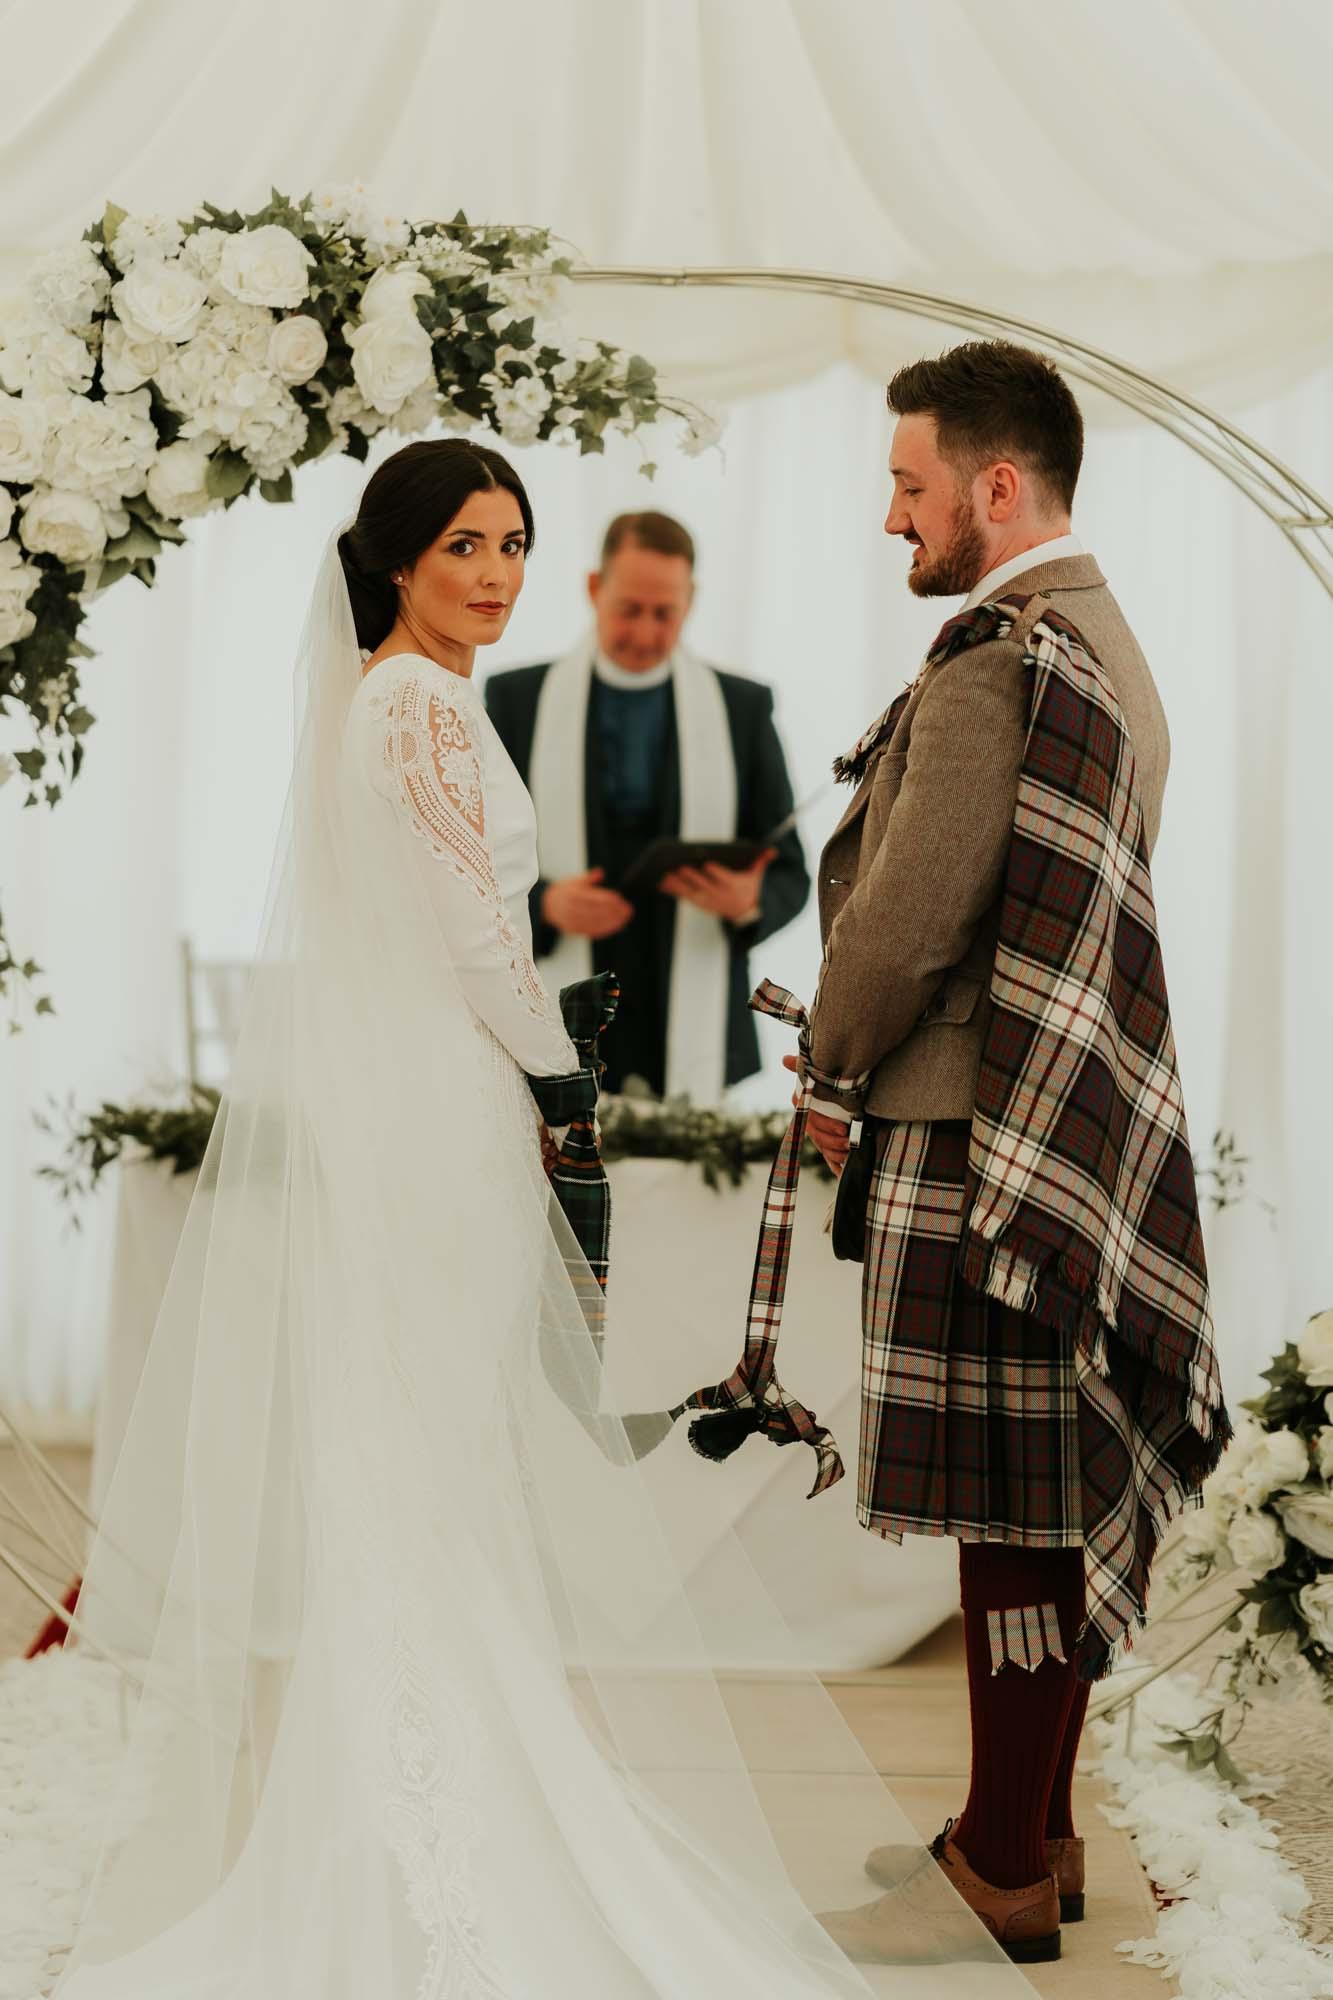 Cornhill Castle Wedding Blog -14